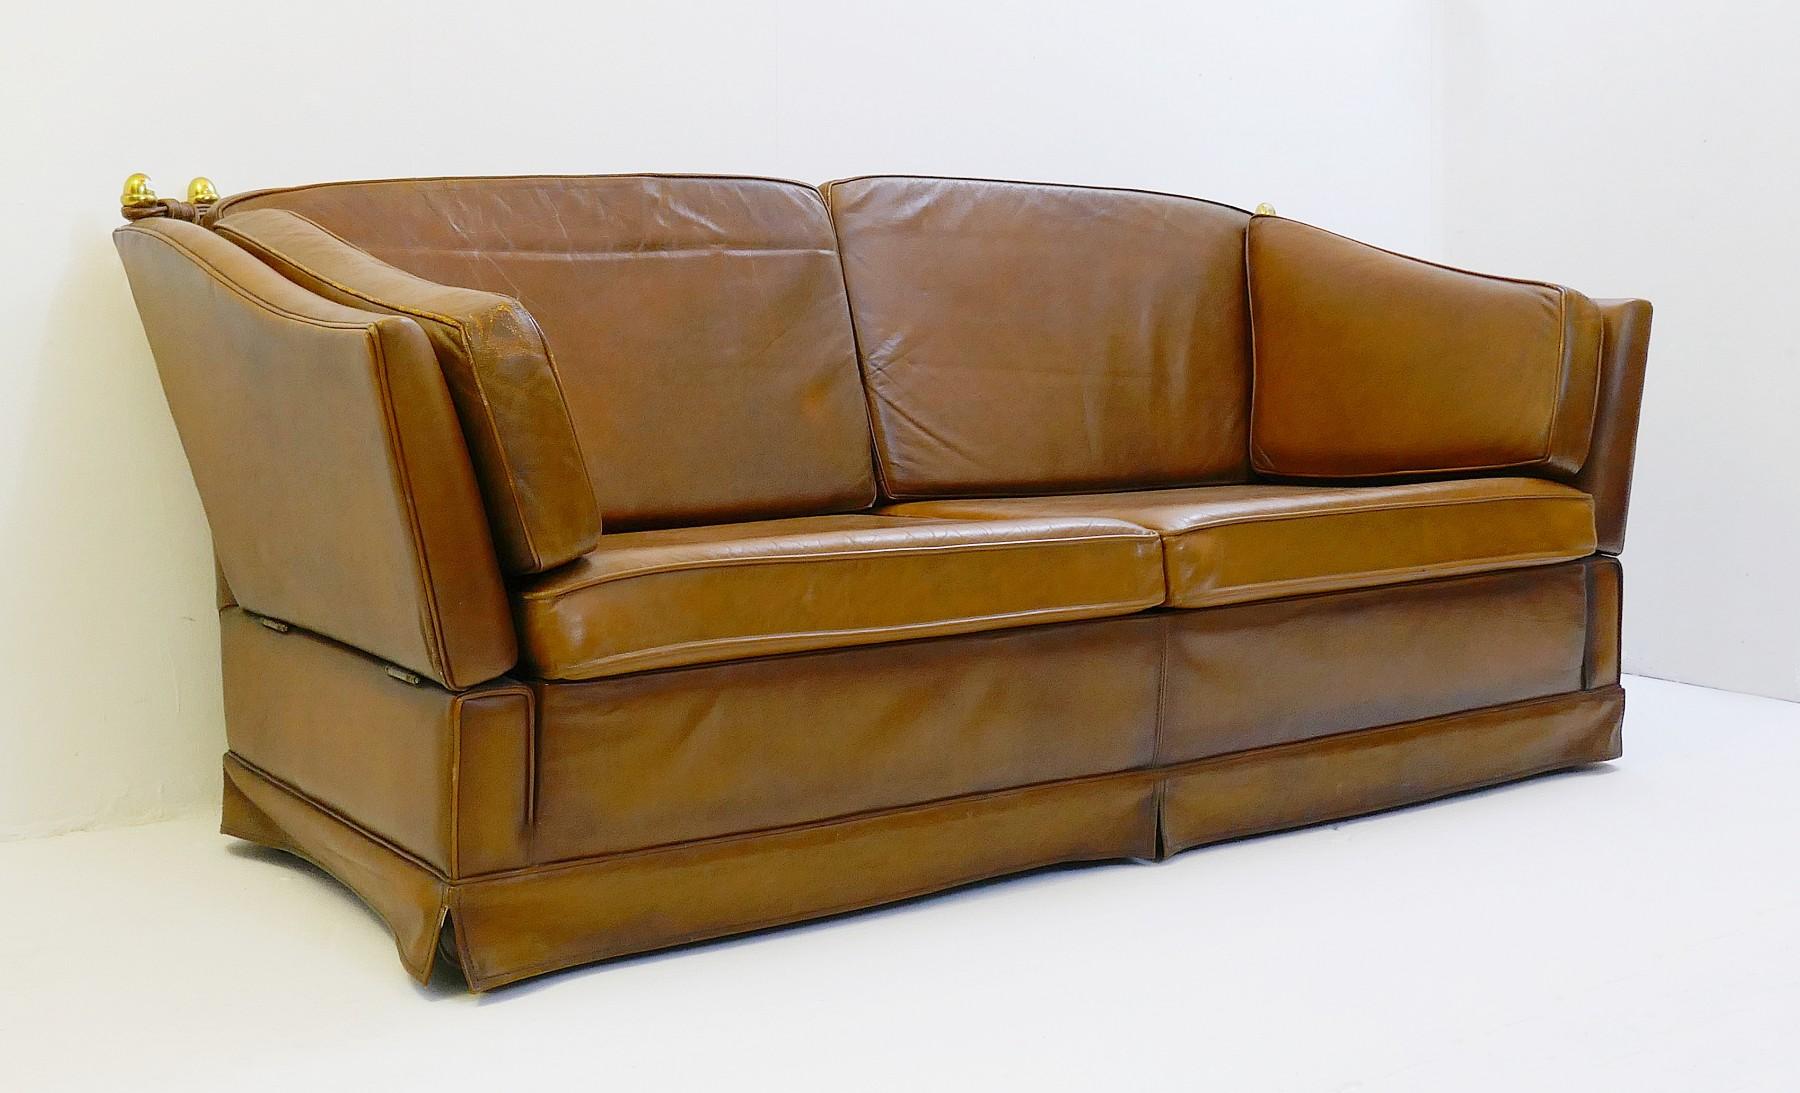 Astonishing Cognac Leather Sofa In The Style Of Maison Jansen Via Bralicious Painted Fabric Chair Ideas Braliciousco